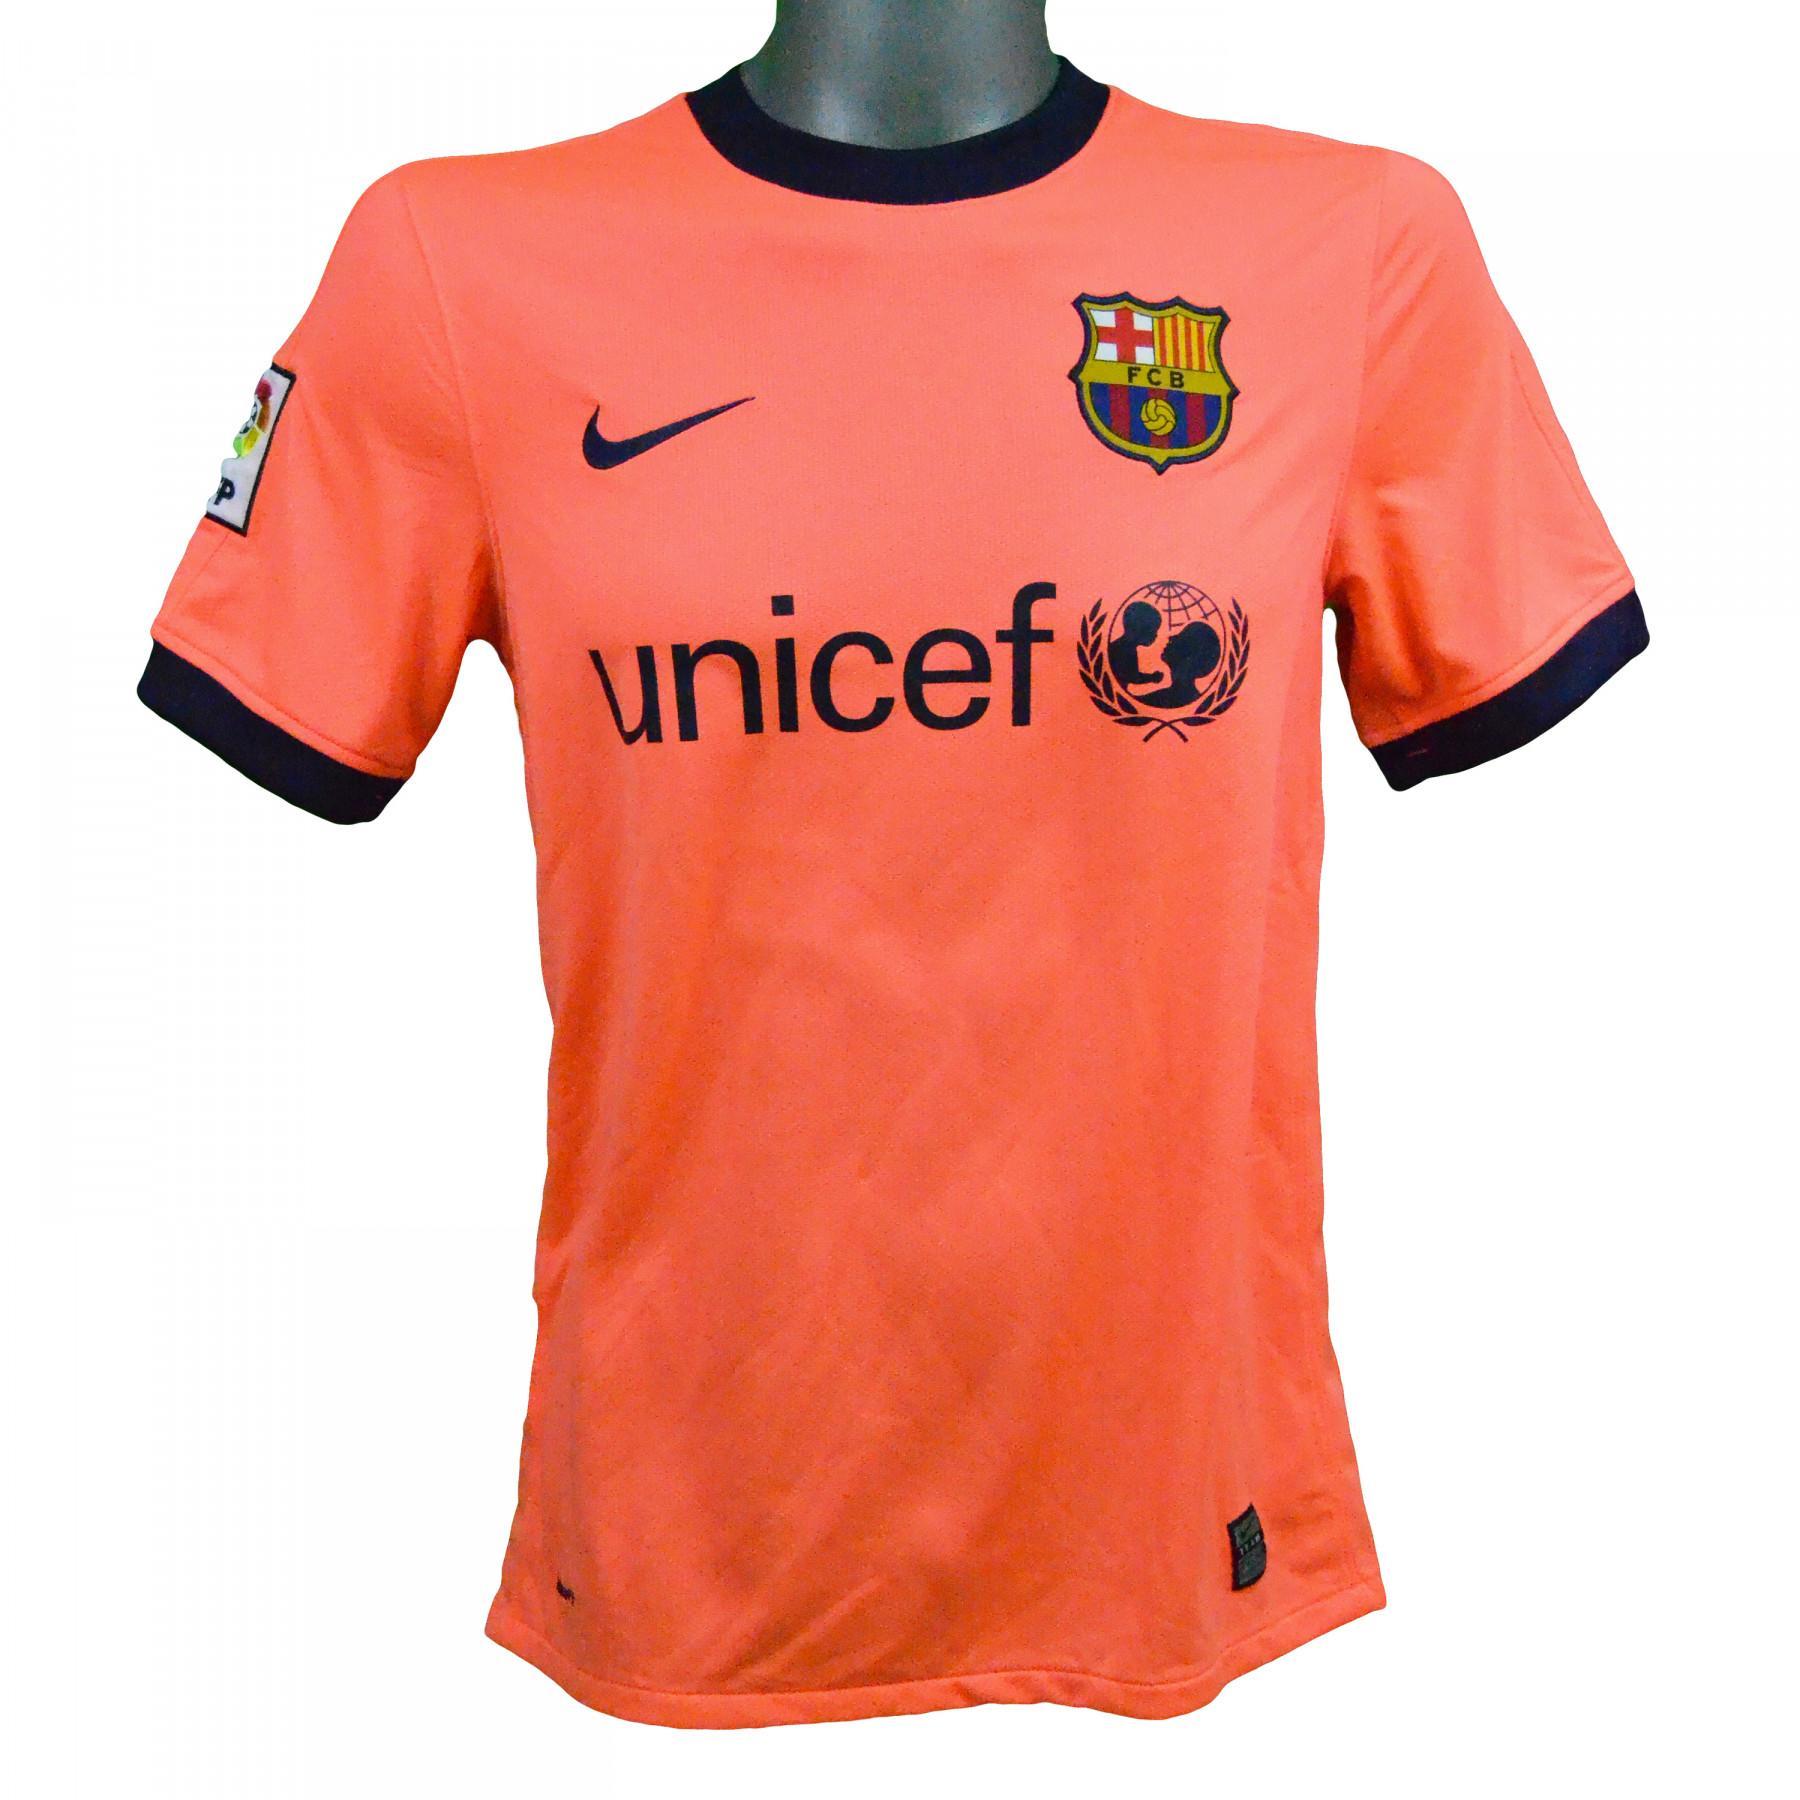 2009/2010 Away Shirt FC Barcelona Xavi